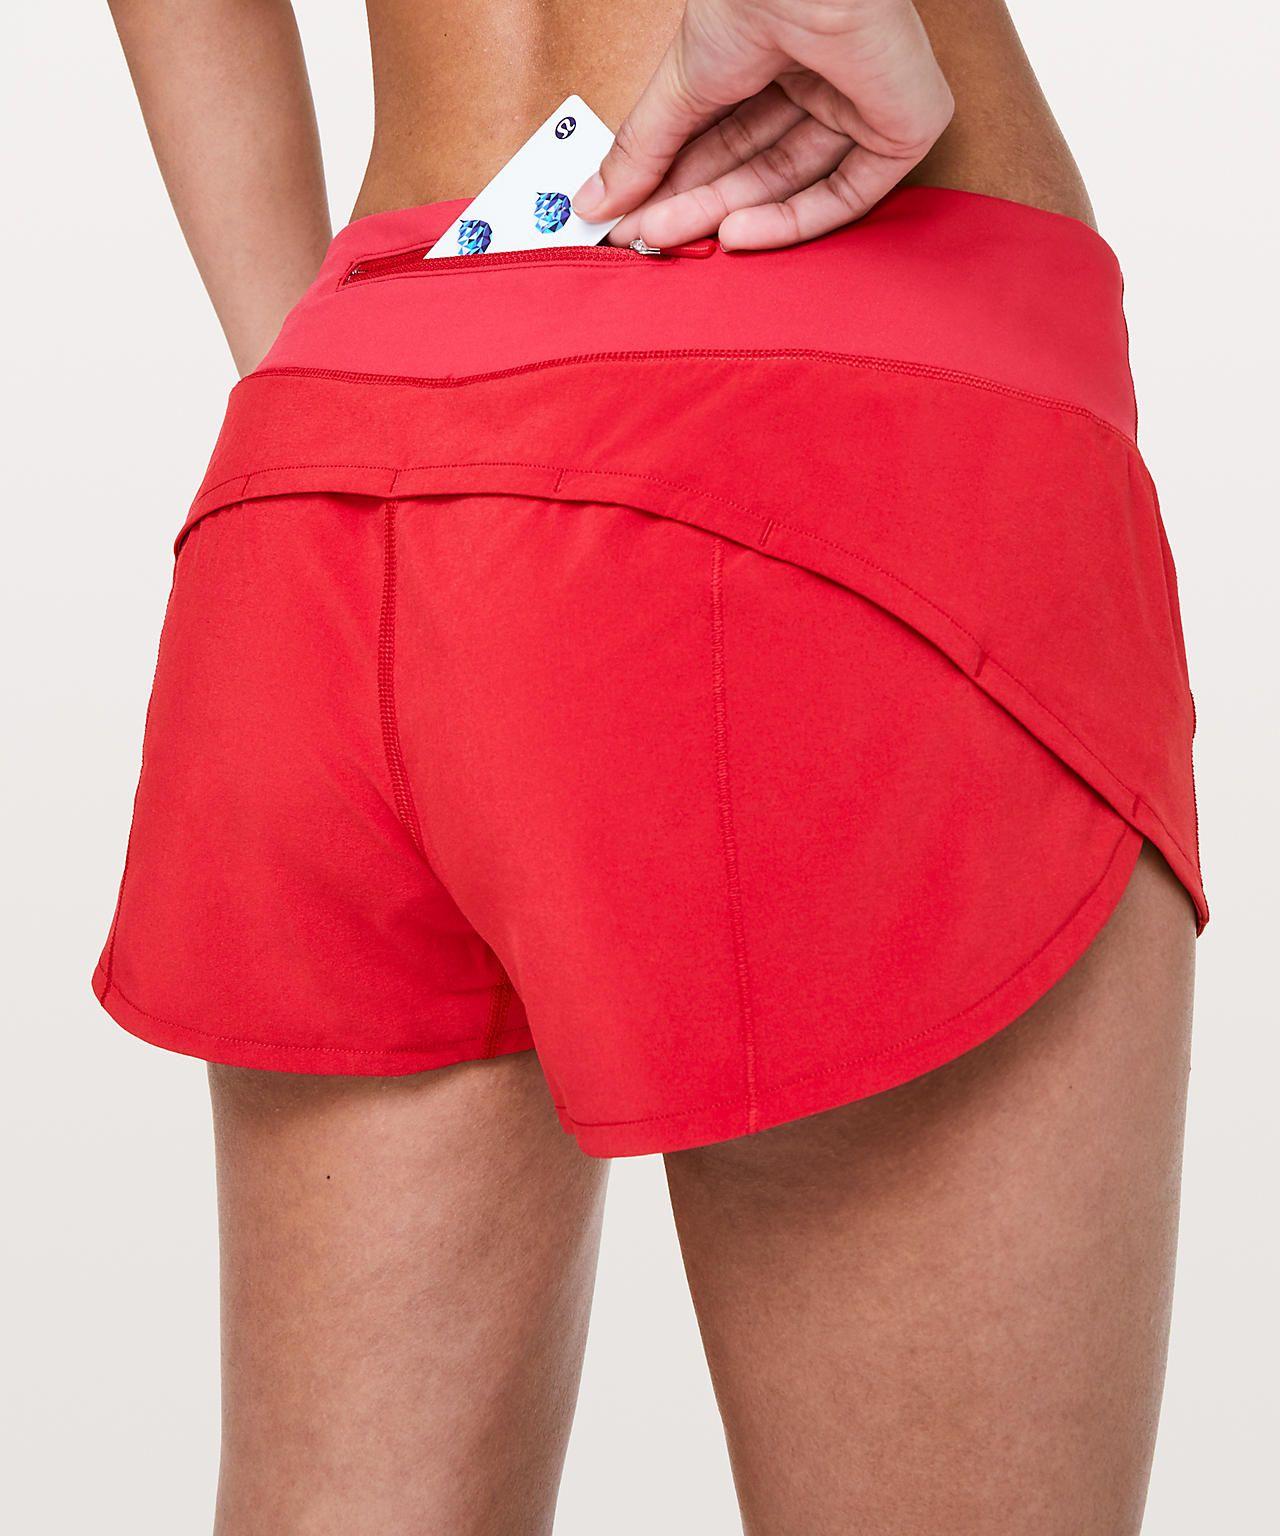 ccad20dd3d Lululemon Speed Up Short *2.5 | wish list | Shorts, Lululemon shorts ...